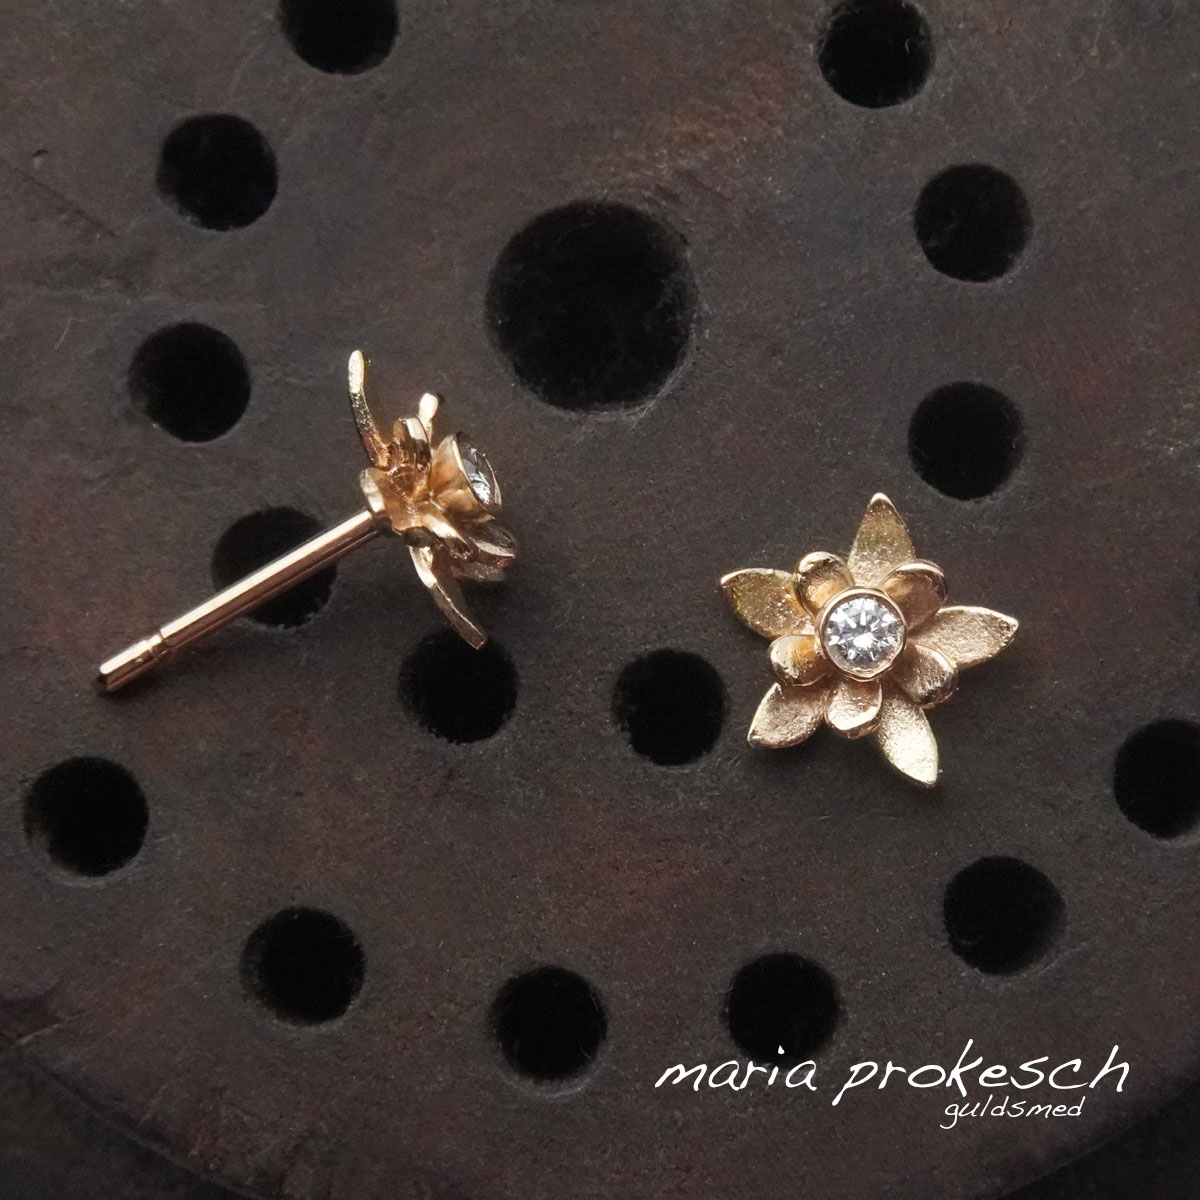 Ørestikkere, 18 kt guldblomster med diamanter i enkelt design.